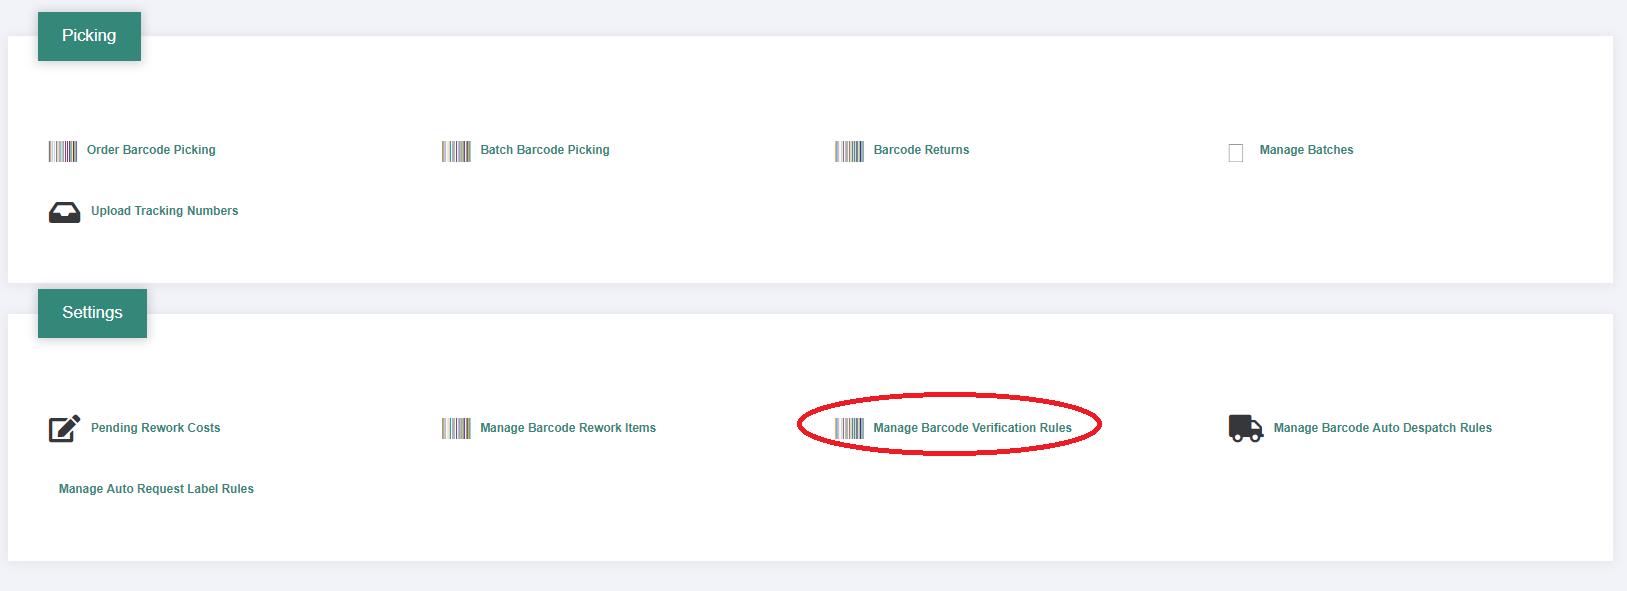 Barcode Verification barcode verified picking – mintsoft - support